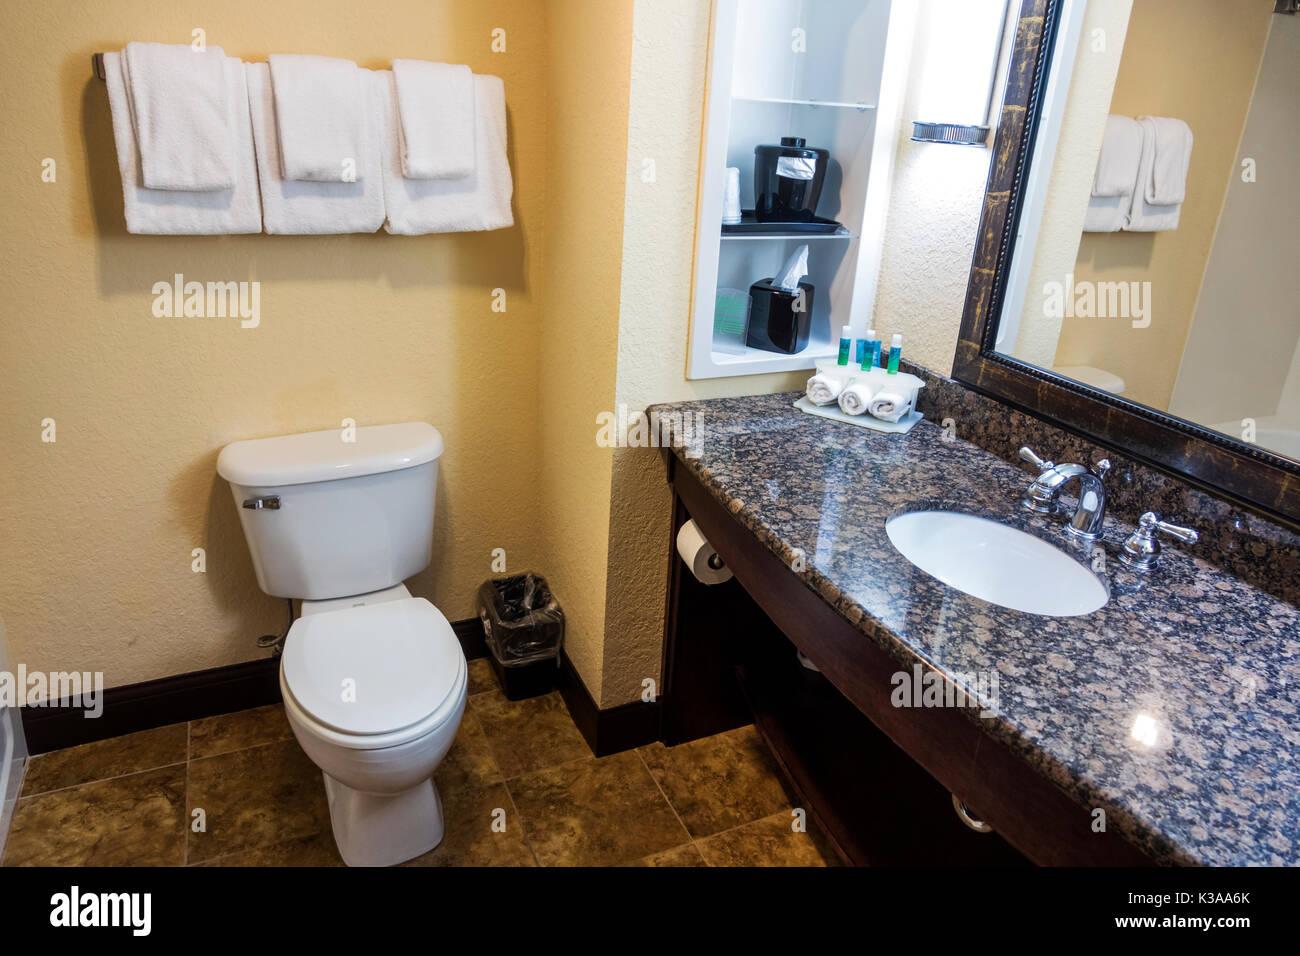 Florida Palm Coast Holiday Inn Express hotel guest room bathroom toilet vanity loo - Stock Image